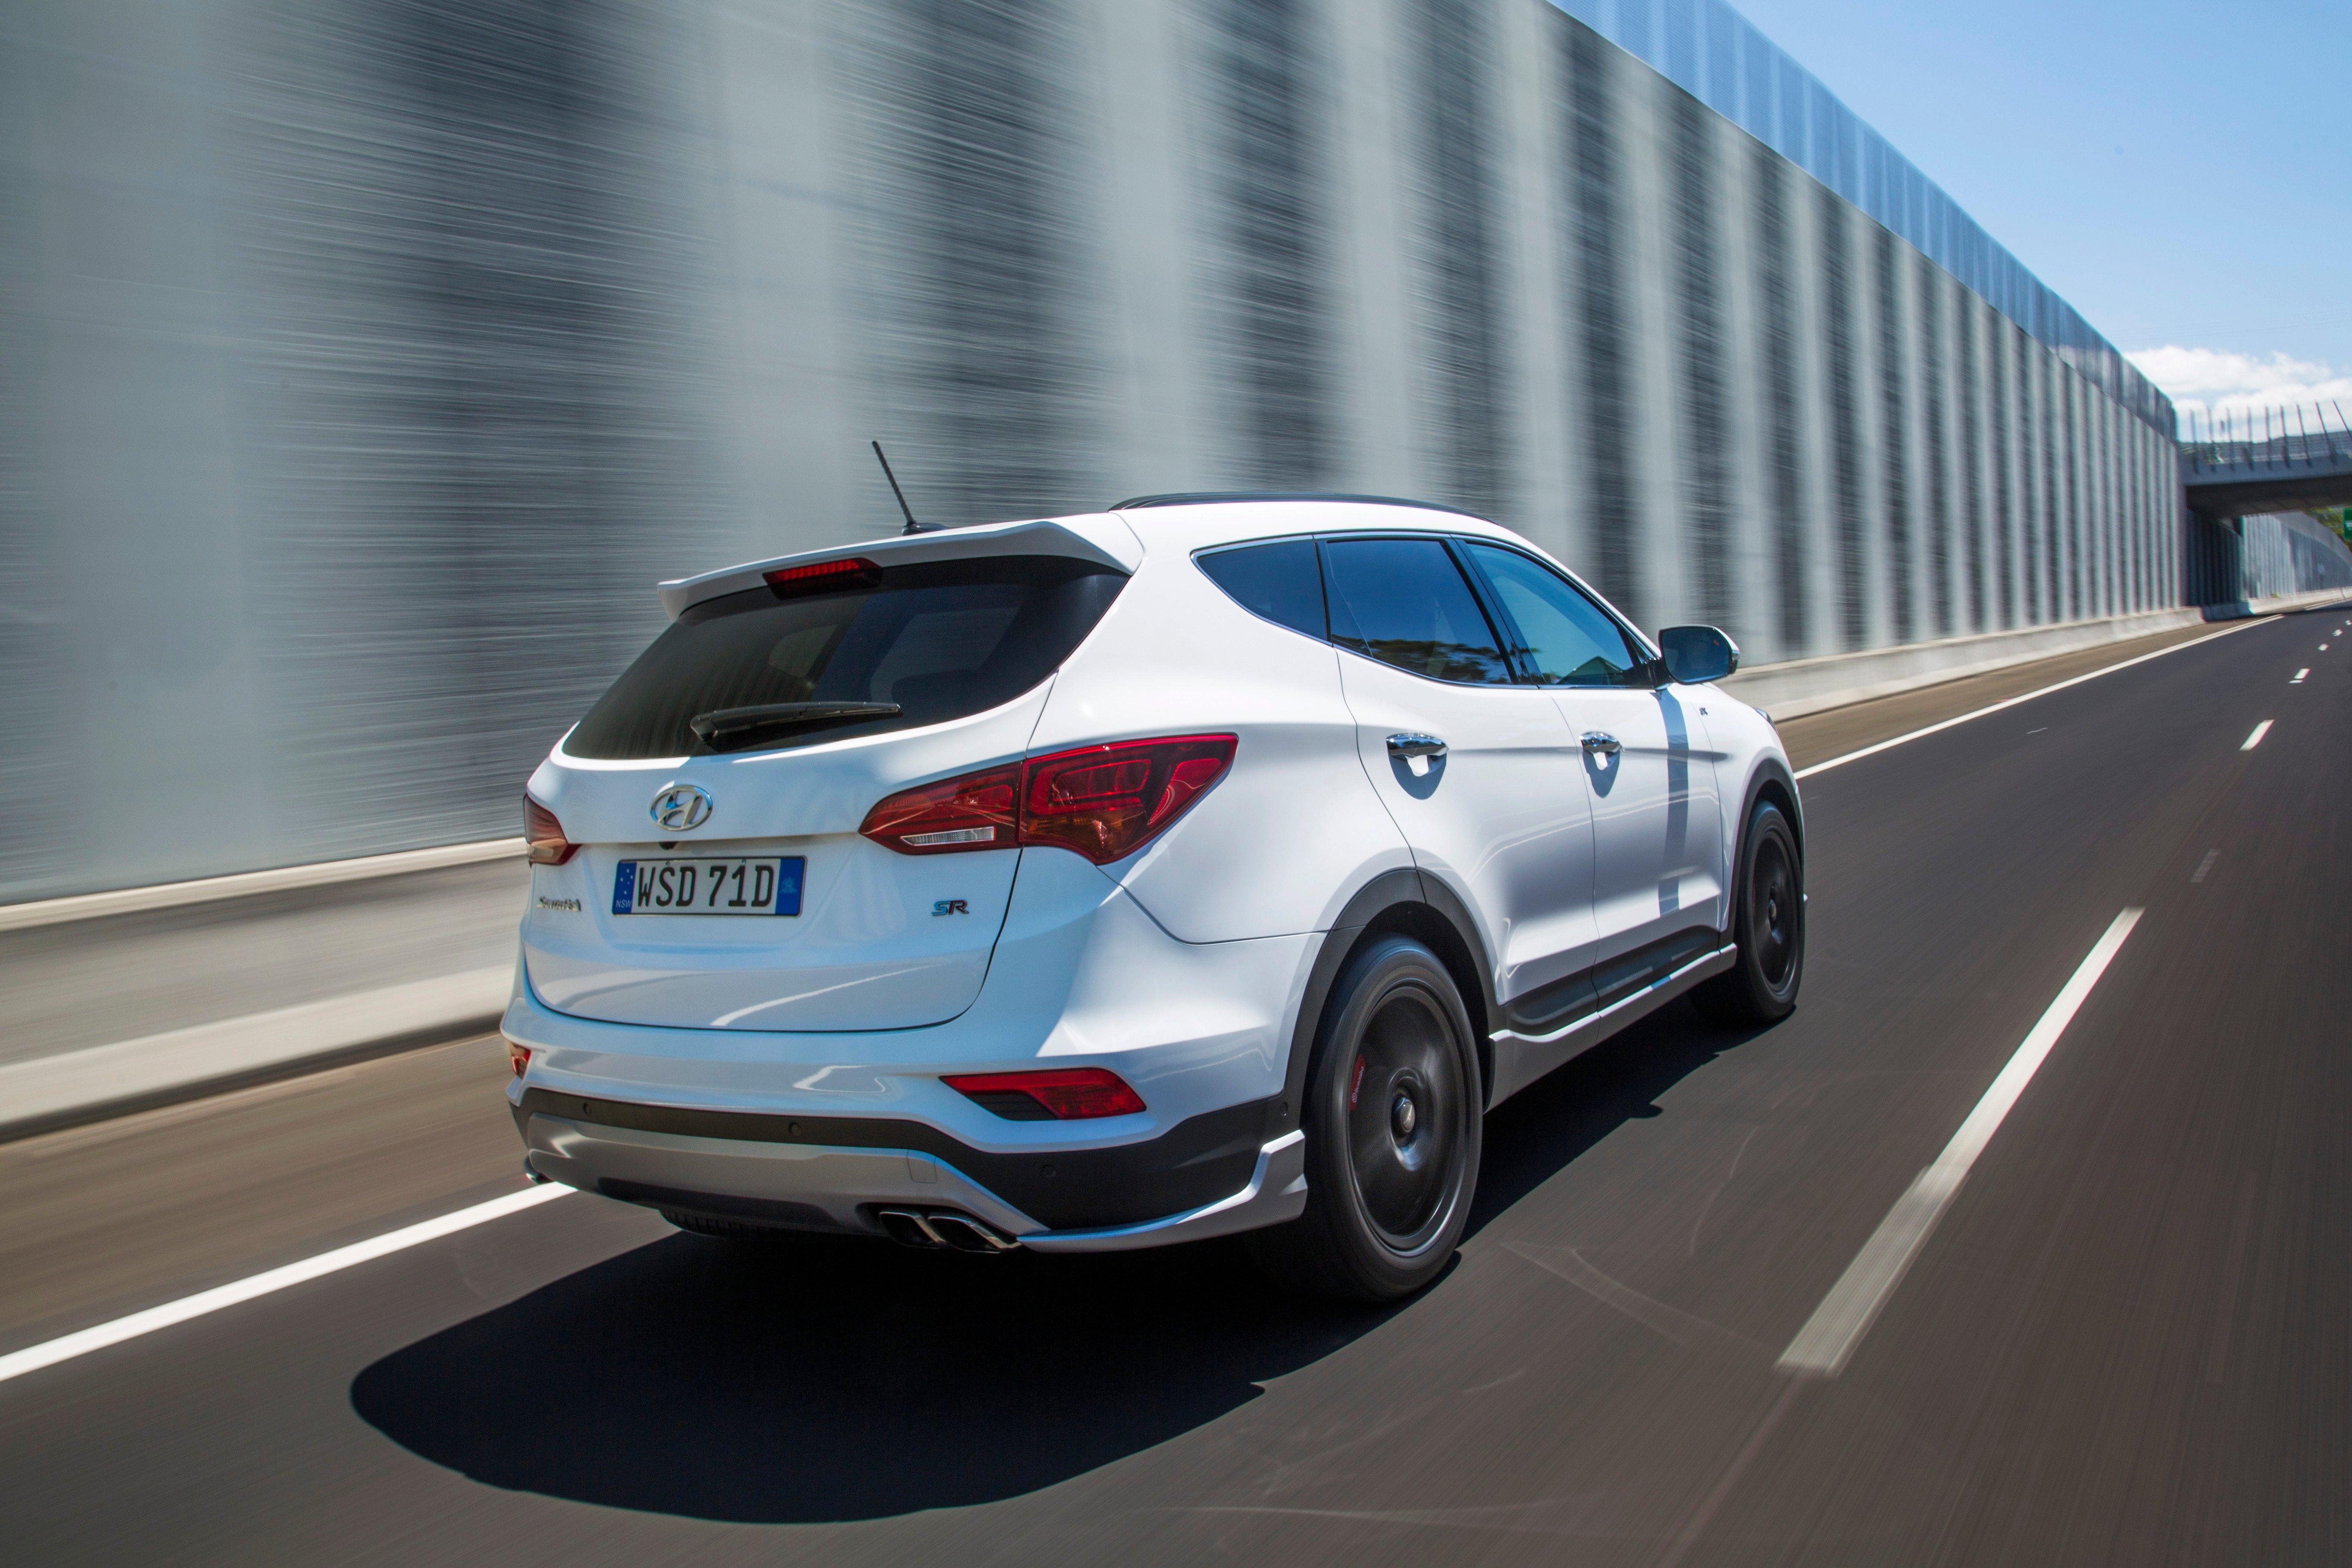 2016 Hyundai Santa Fe >> 2016 Hyundai Santa Fe Review - photos | CarAdvice